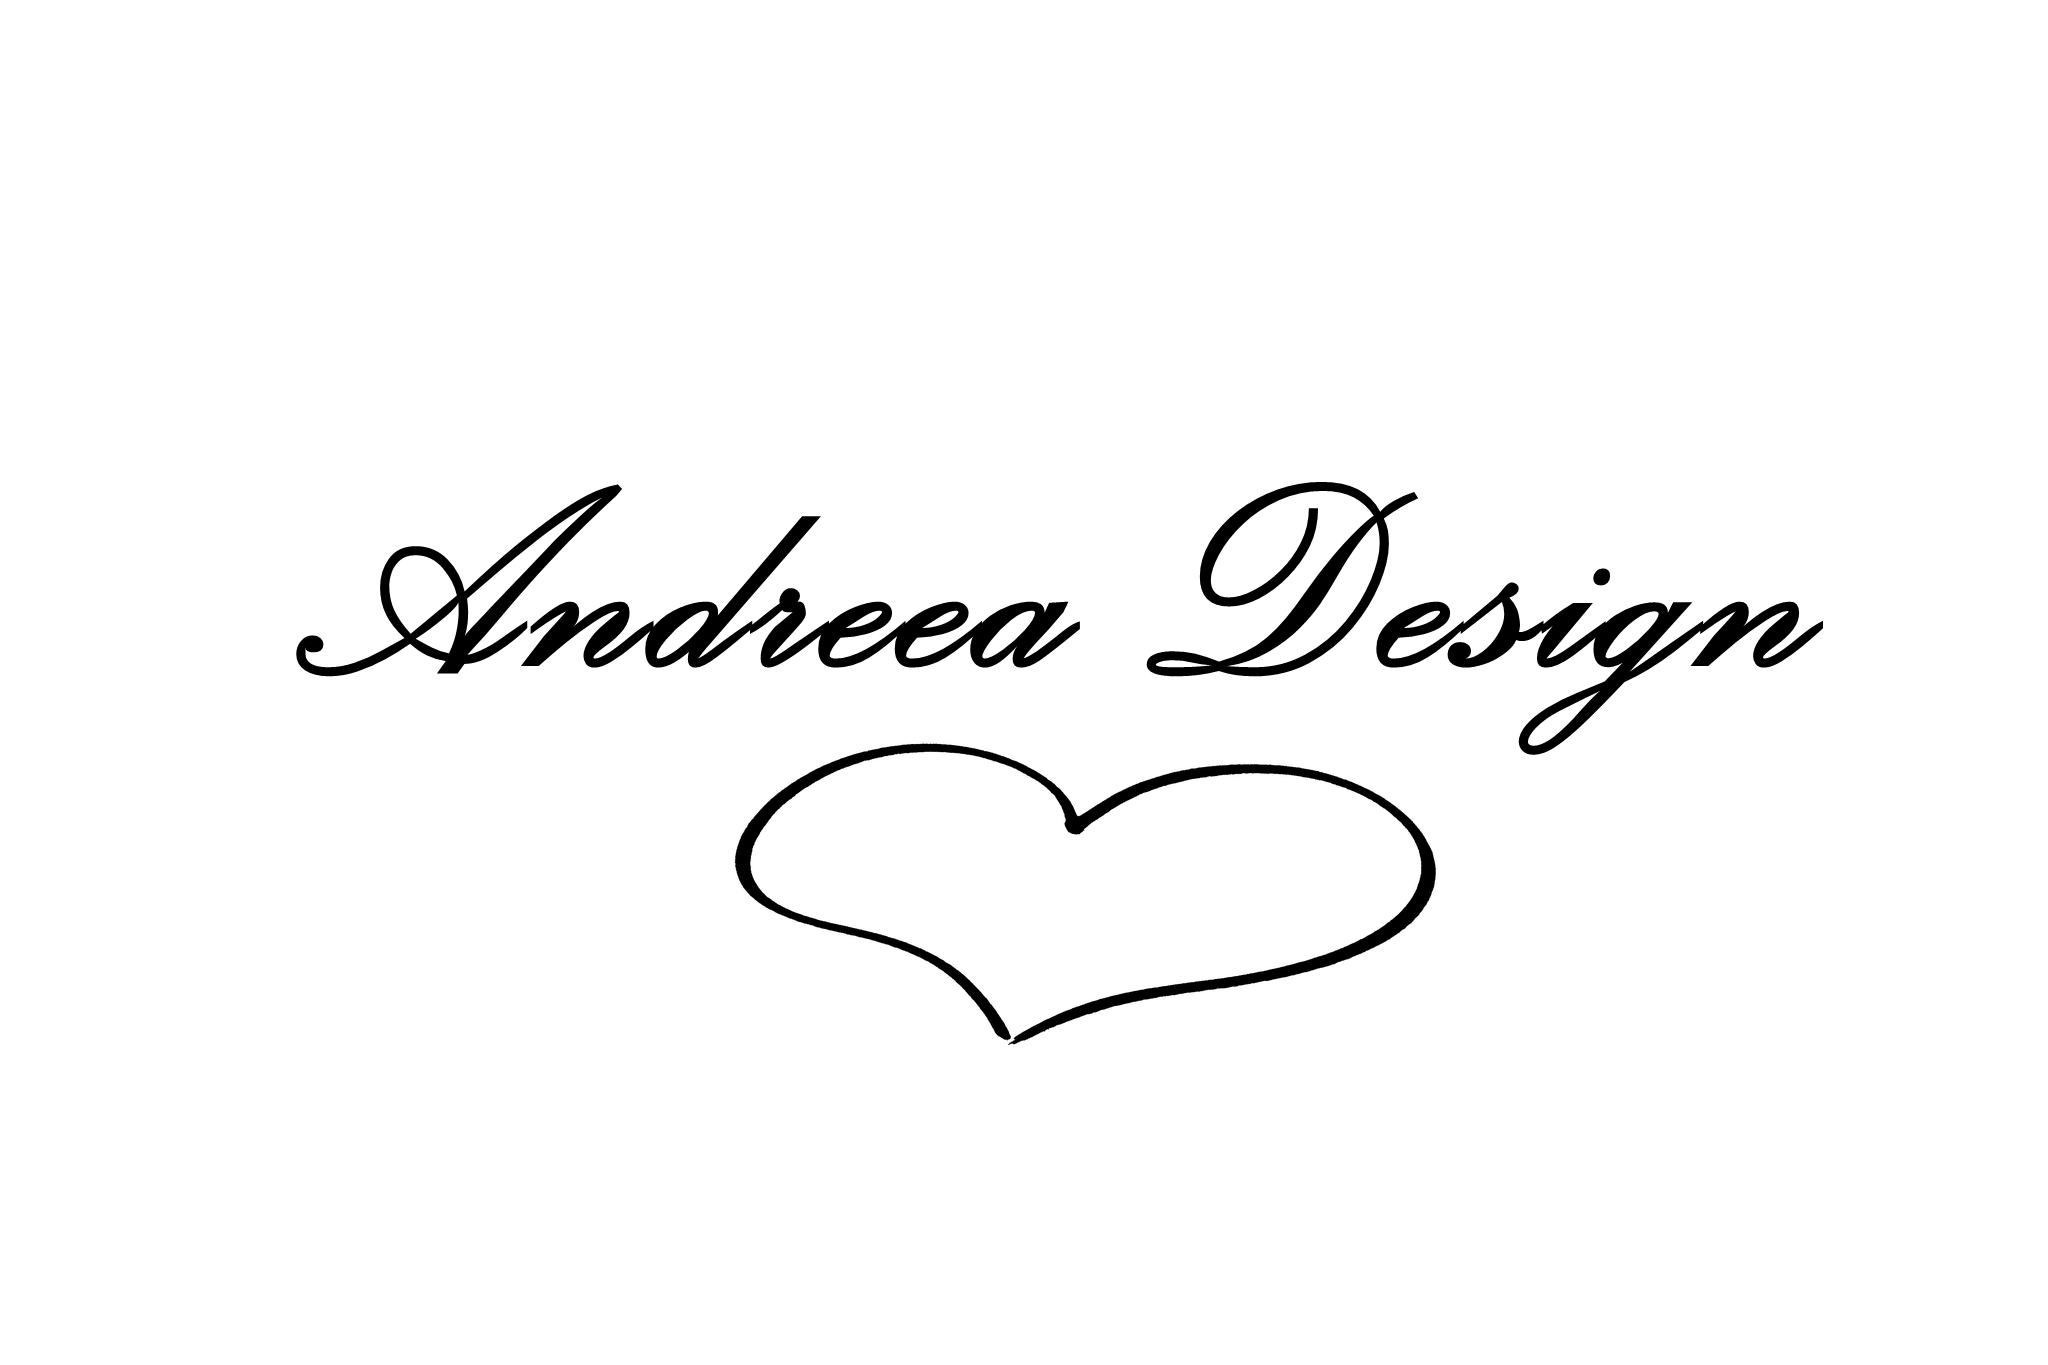 andreea design